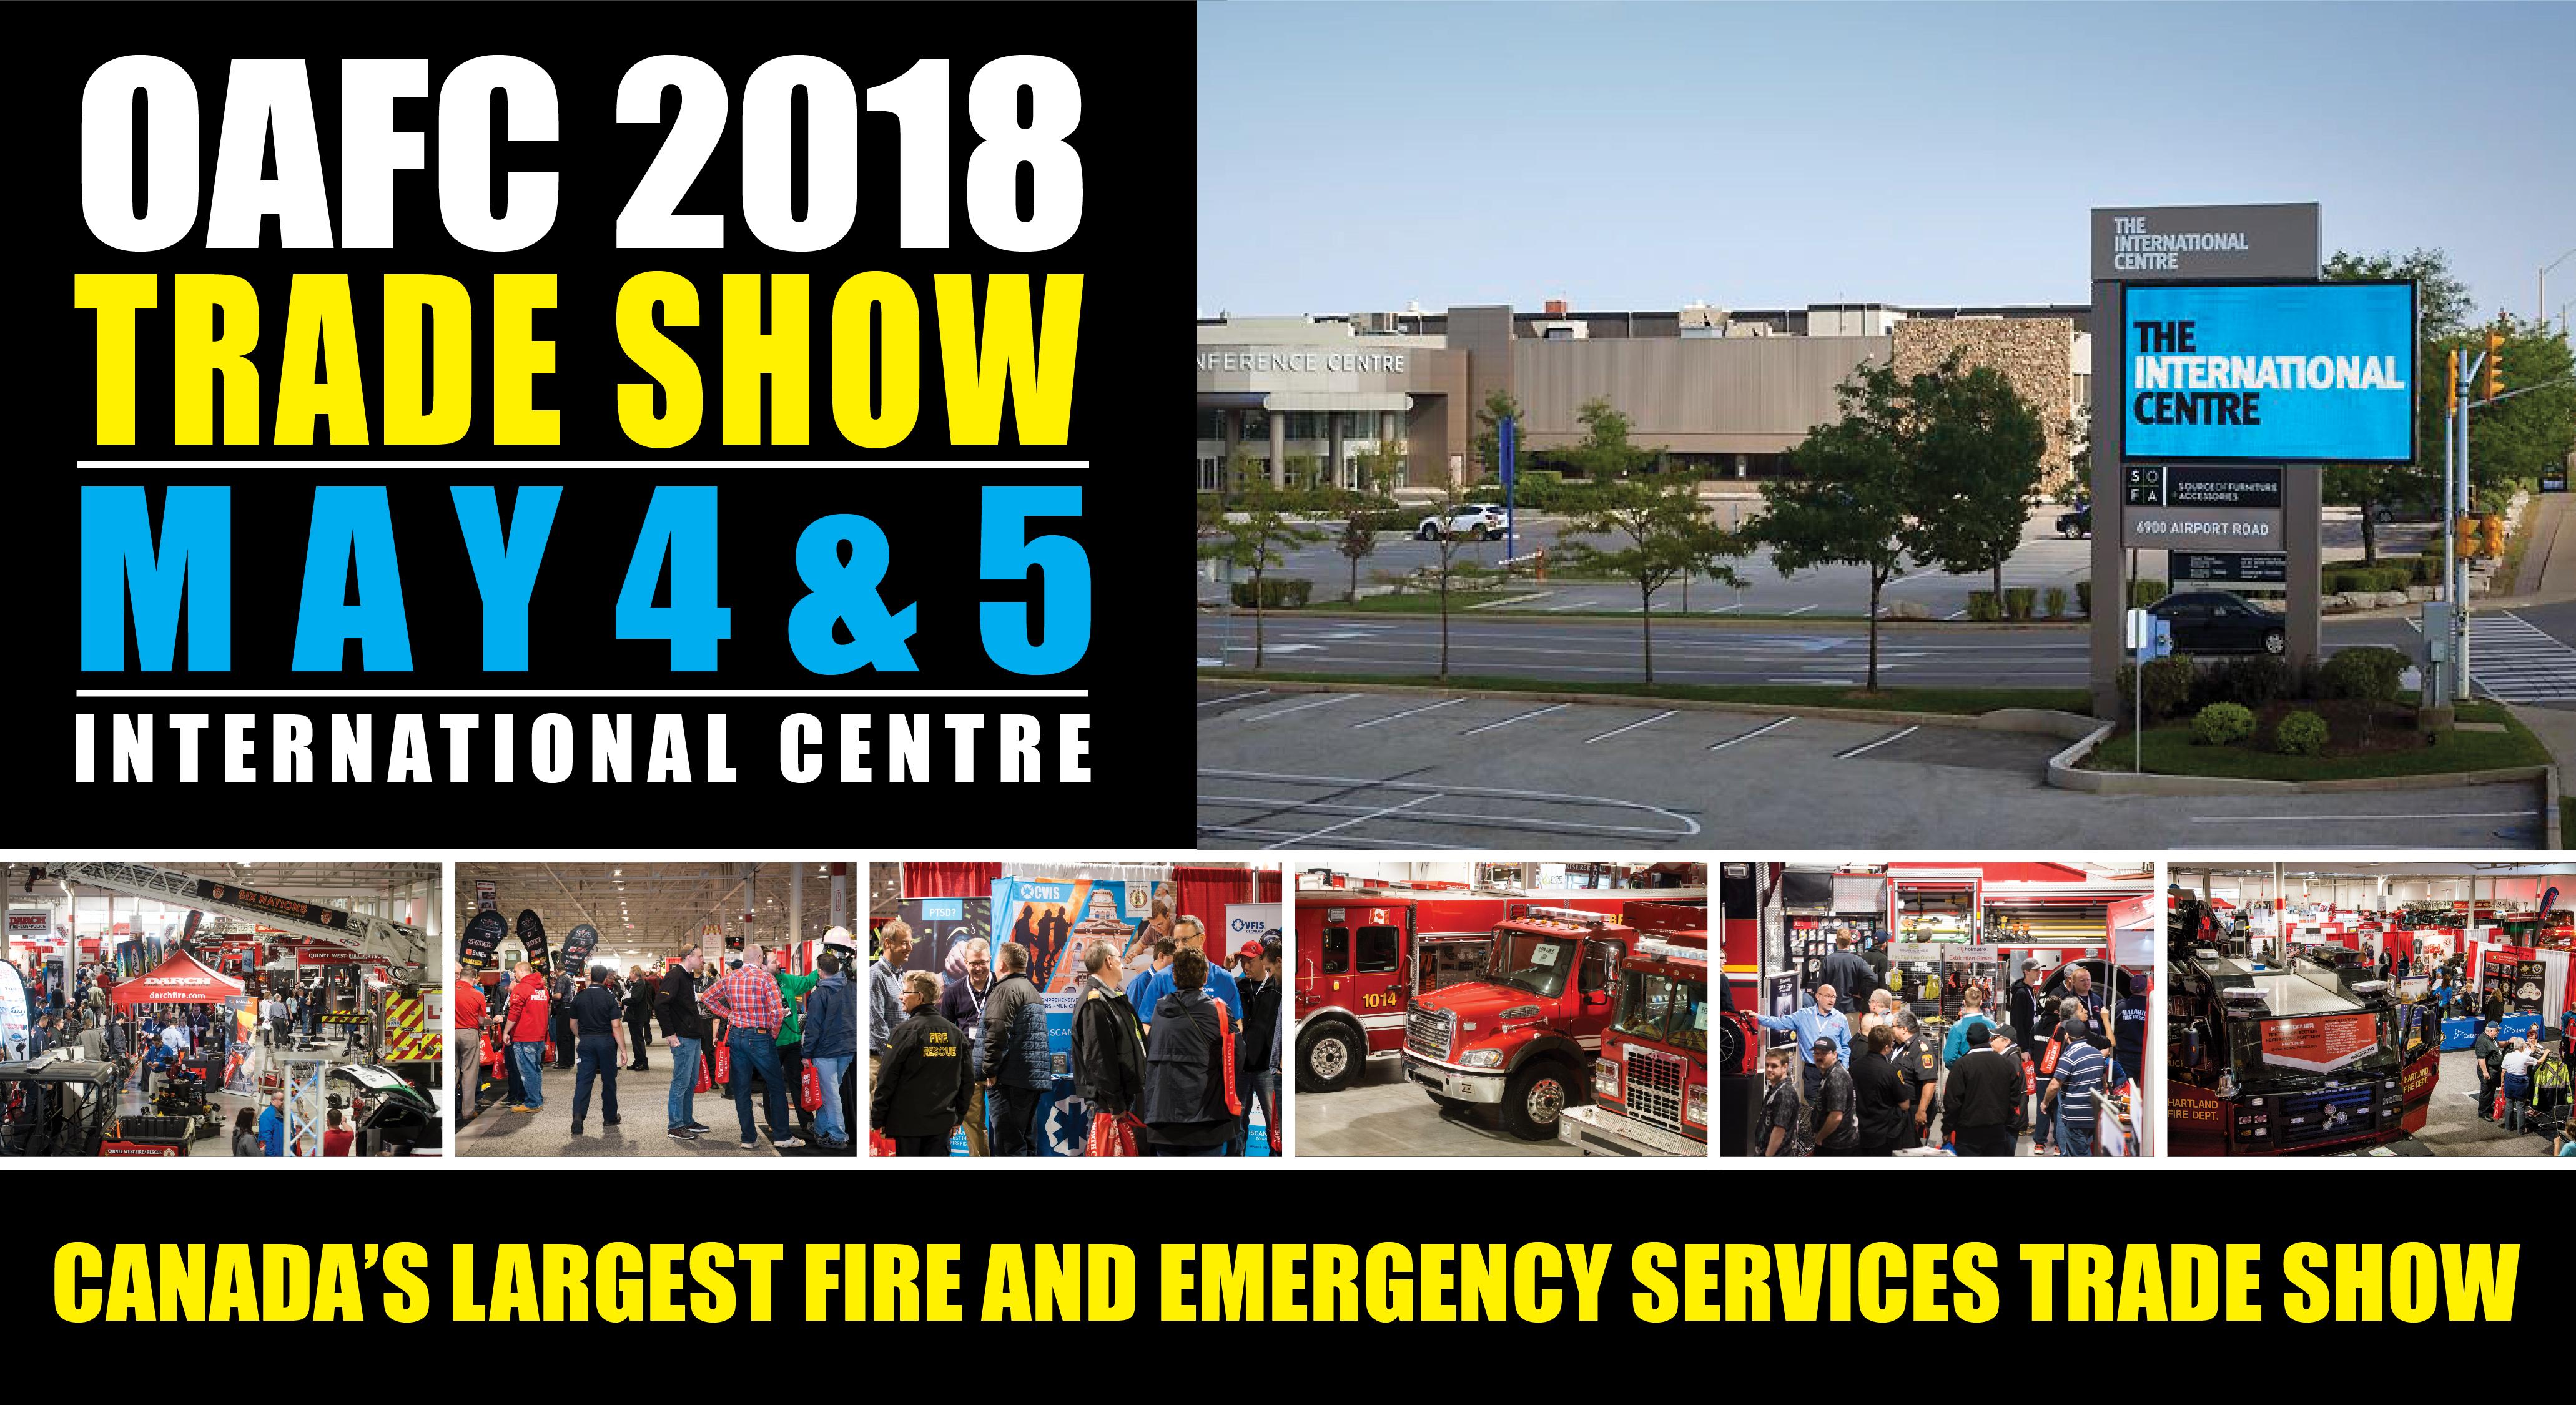 OAFC 2018 Trade Show